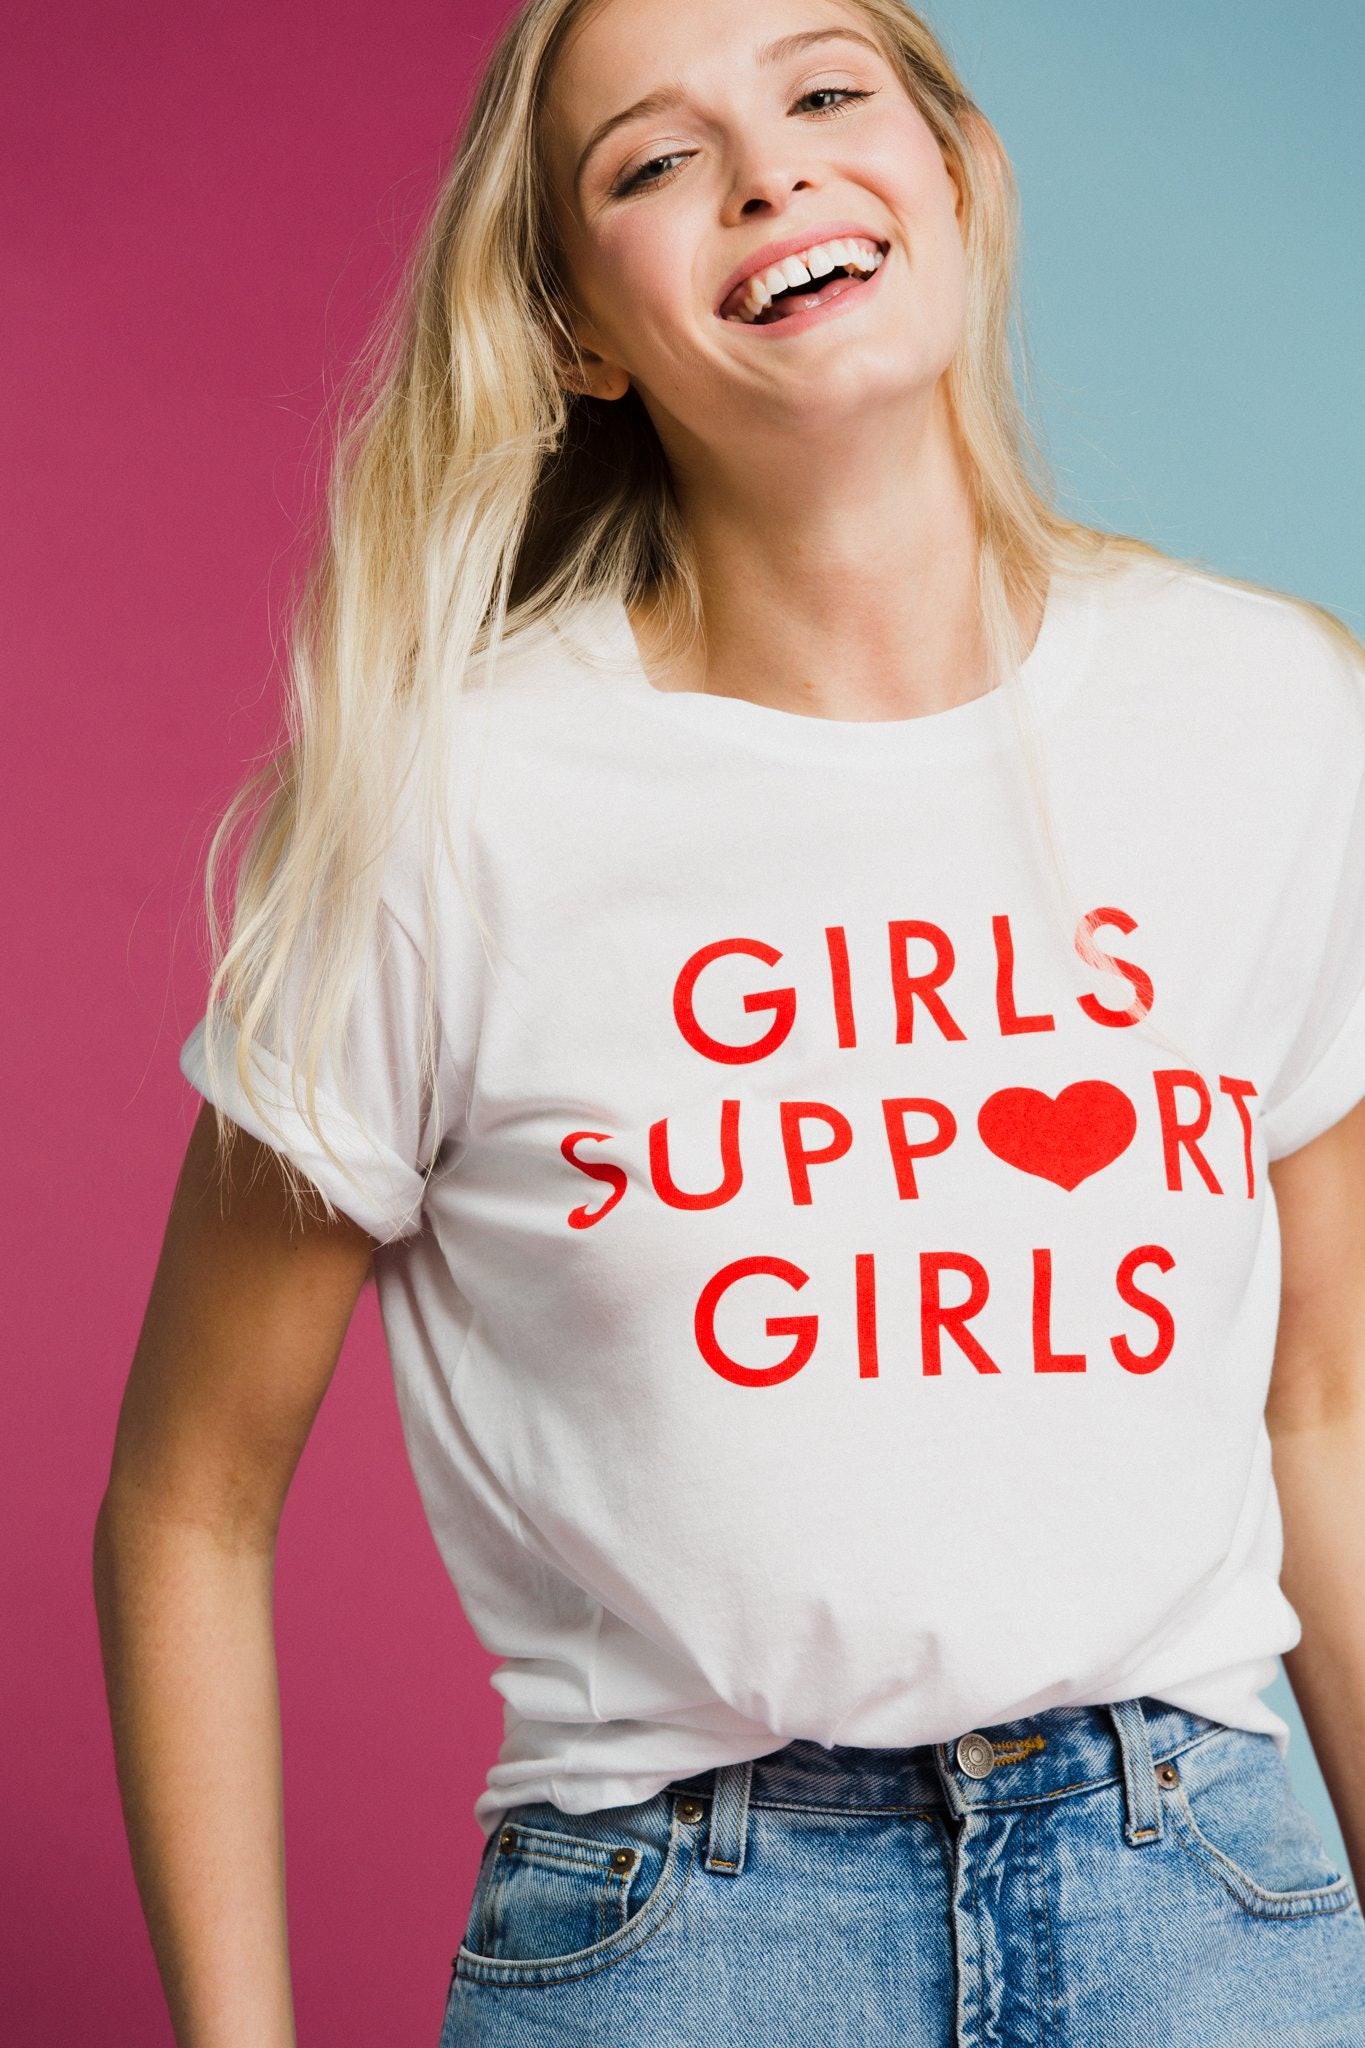 070da47784 10 International Women's Day T-Shirts & Accessories To Celebrate Girl Power